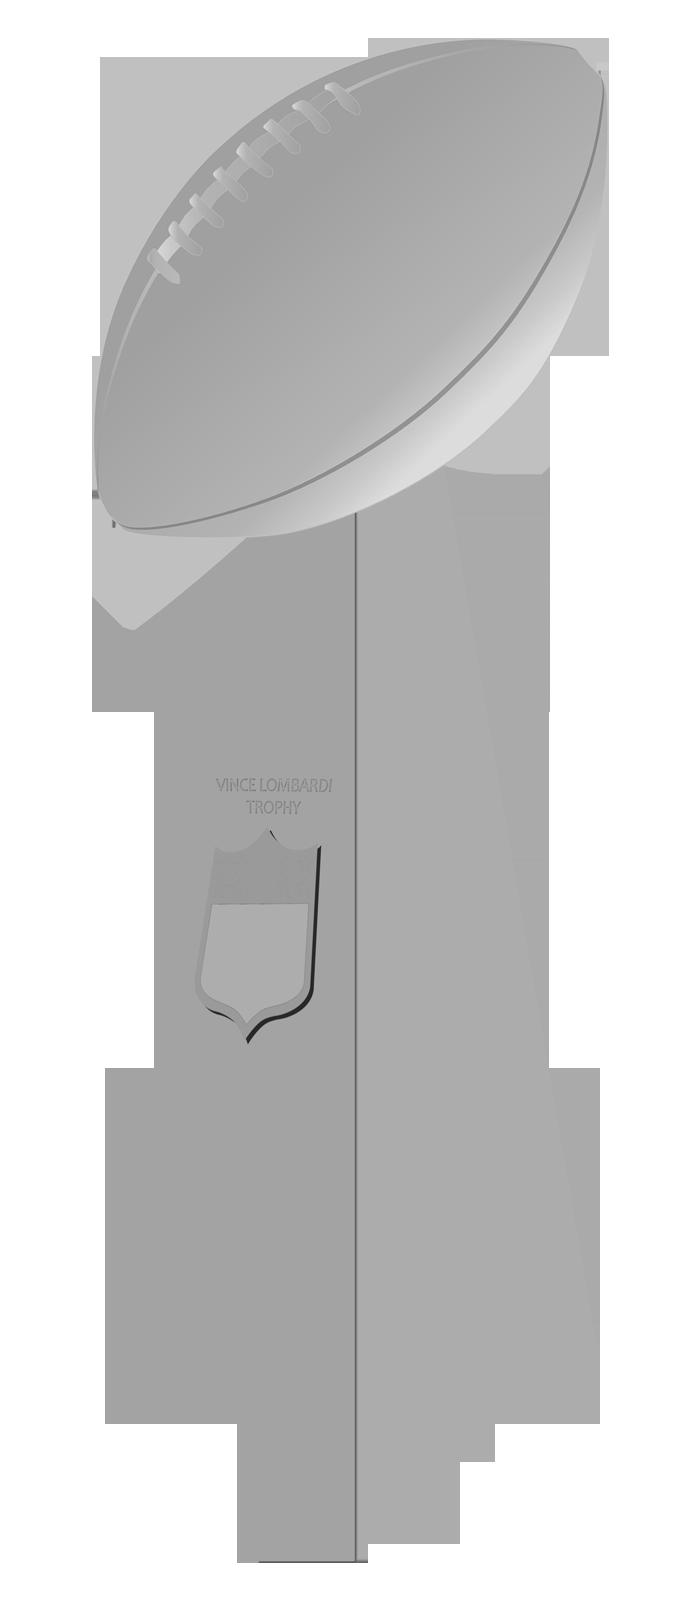 Vince Lombardi Trophy.